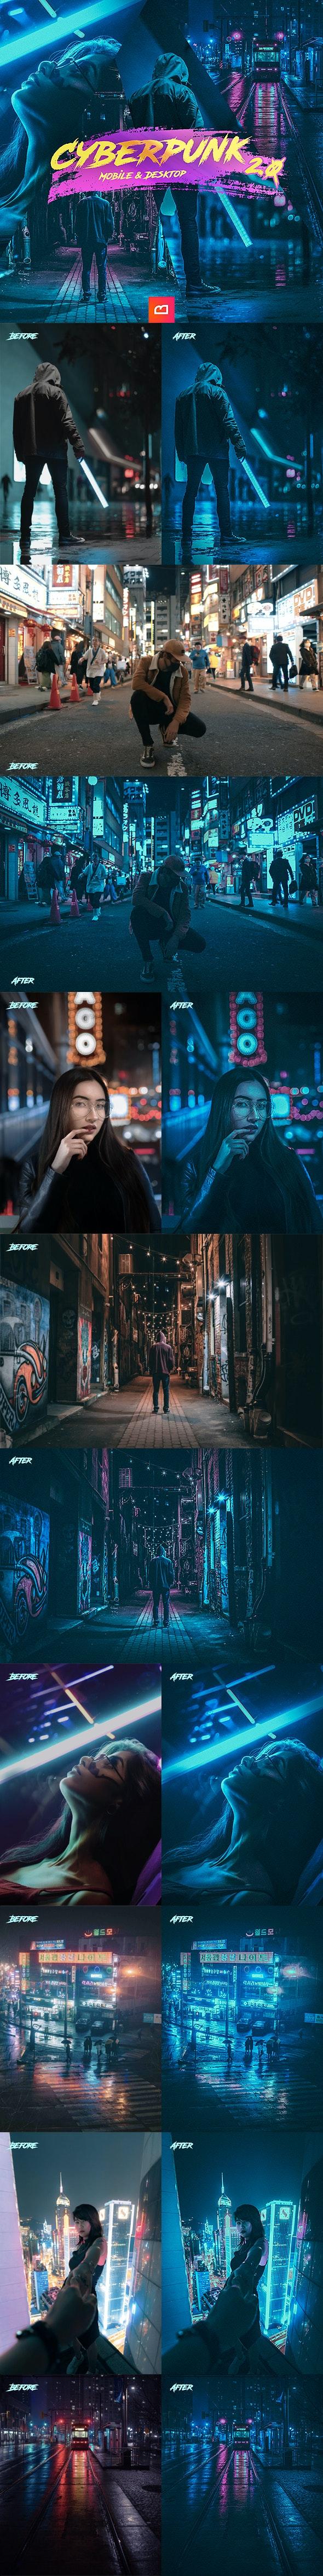 Artistic Collection - Cyberpunk 2.0 Lightroom Preset (Mobile & Desktop) - Cinematic Lightroom Presets